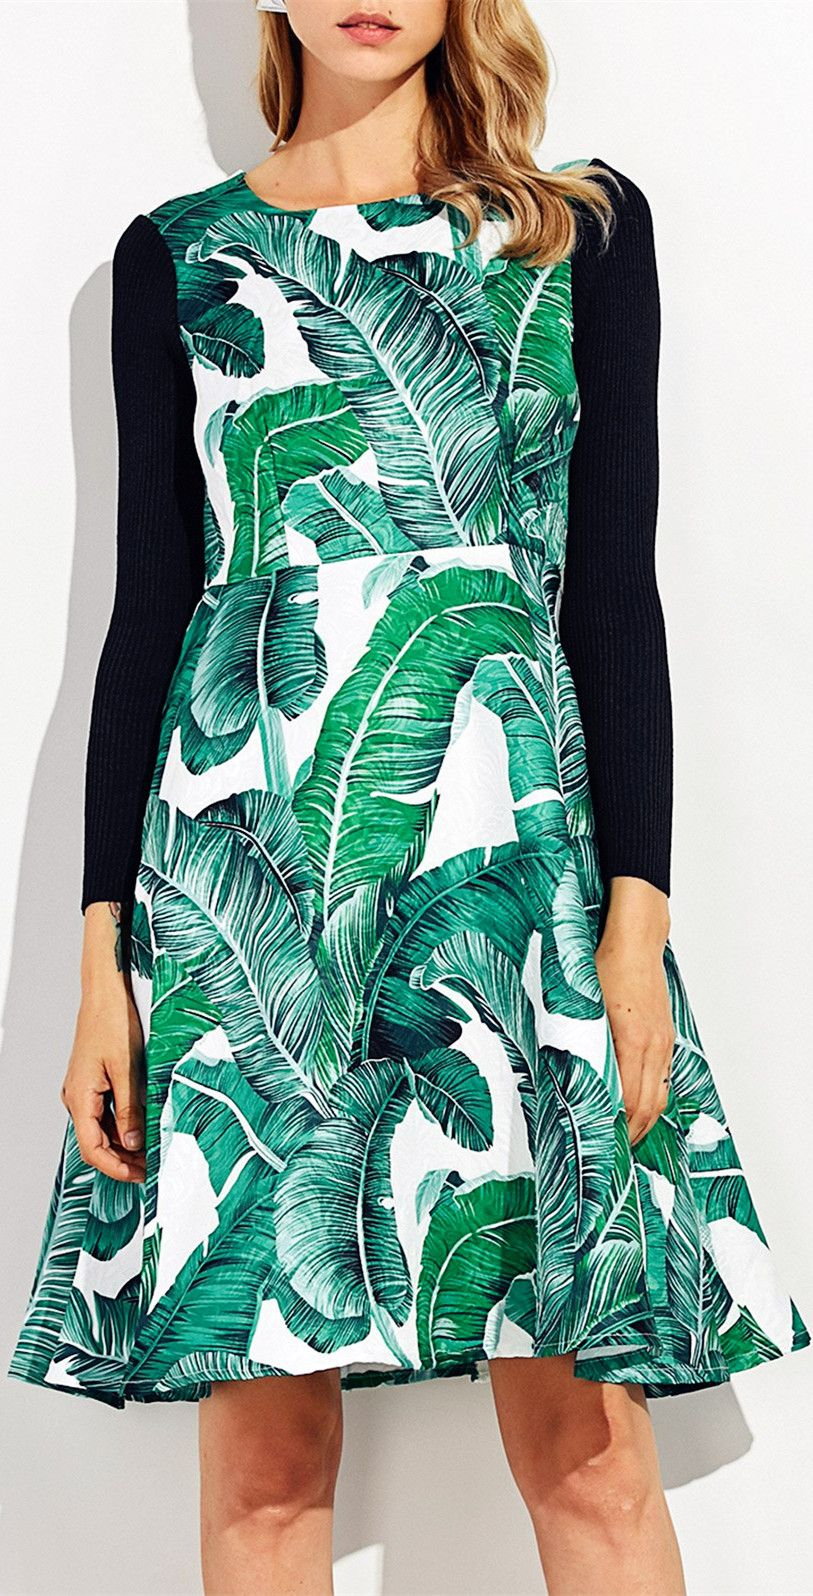 Knitted Sleeve Leaf Printed Flare Dress